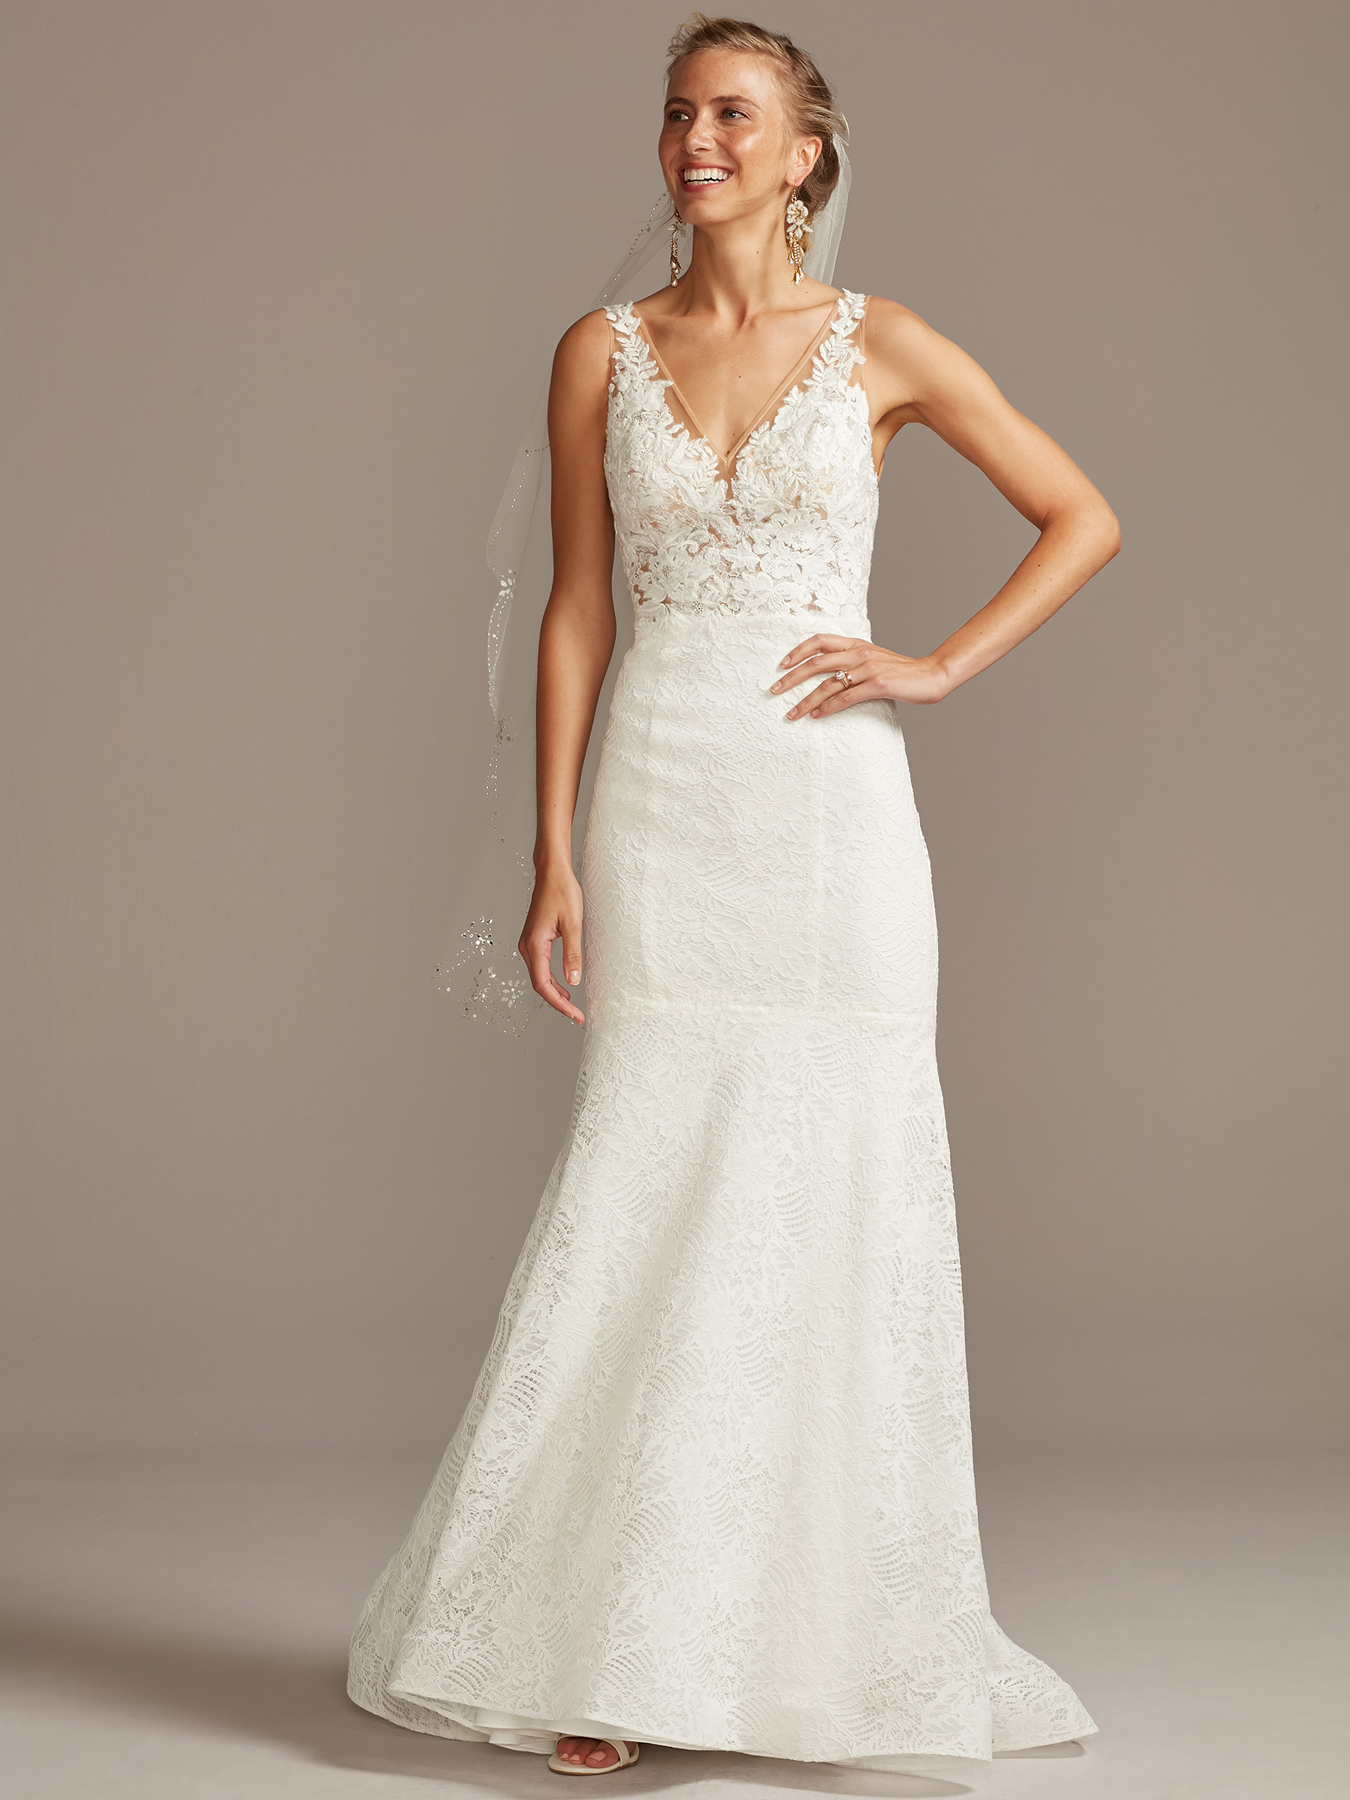 Melissa Sweet for David's Bridal's Spring 20 Wedding Dresses ...